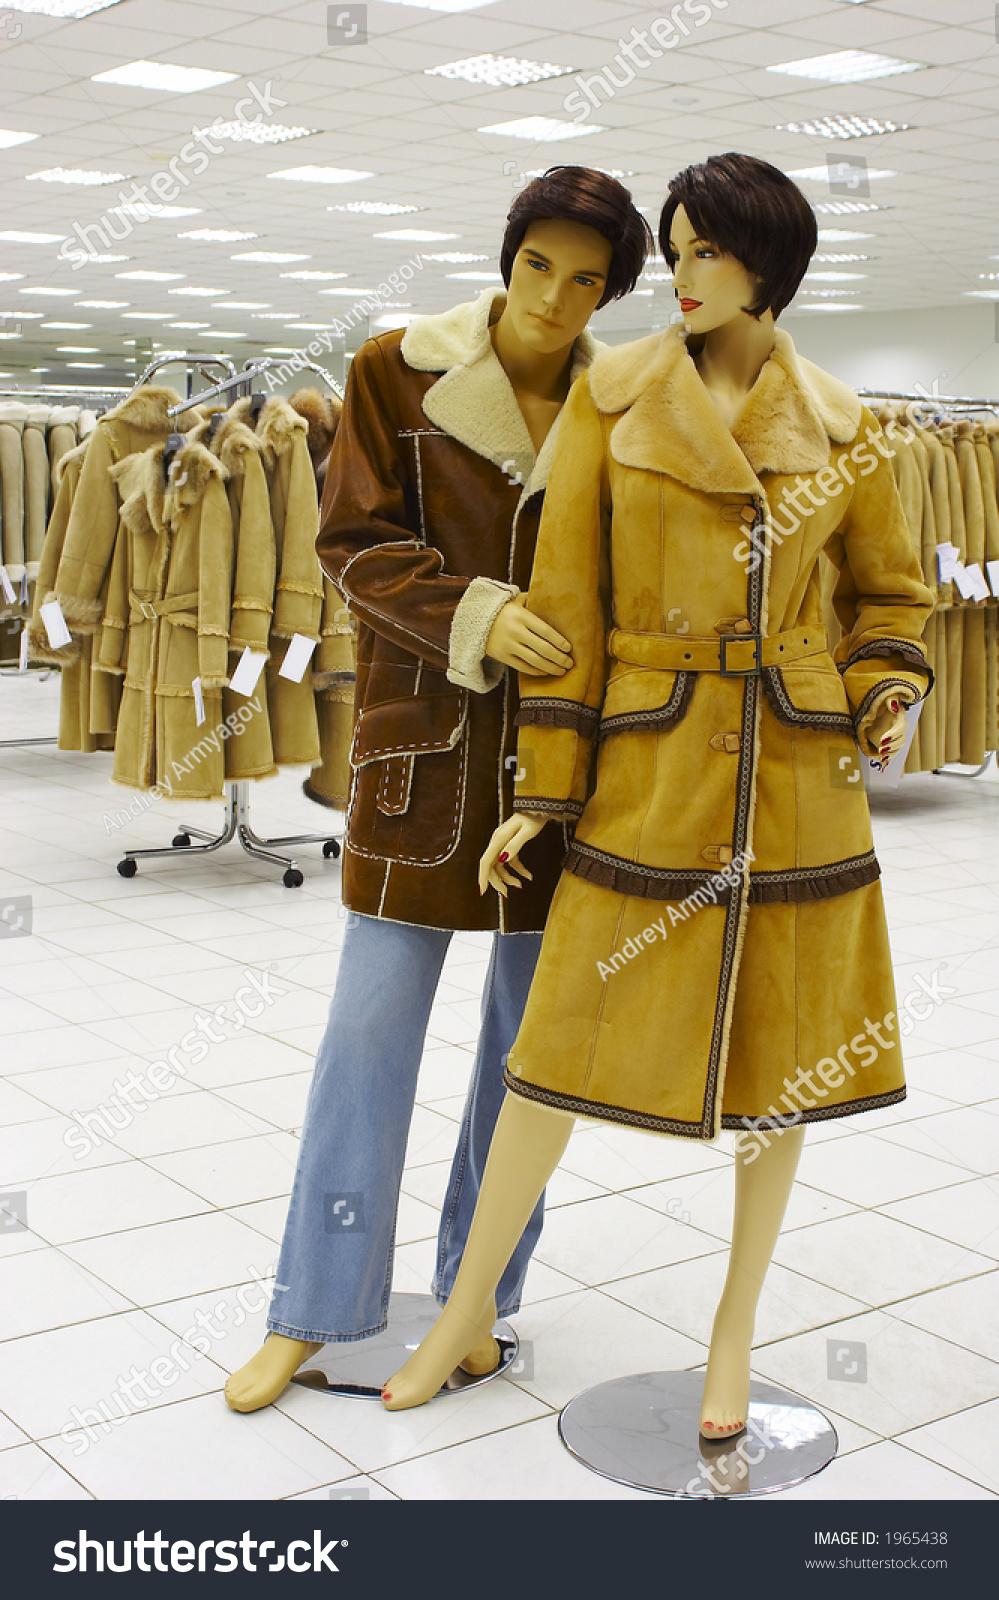 Mannequin Magazine On Sale Winter Clothing Stock Photo ...